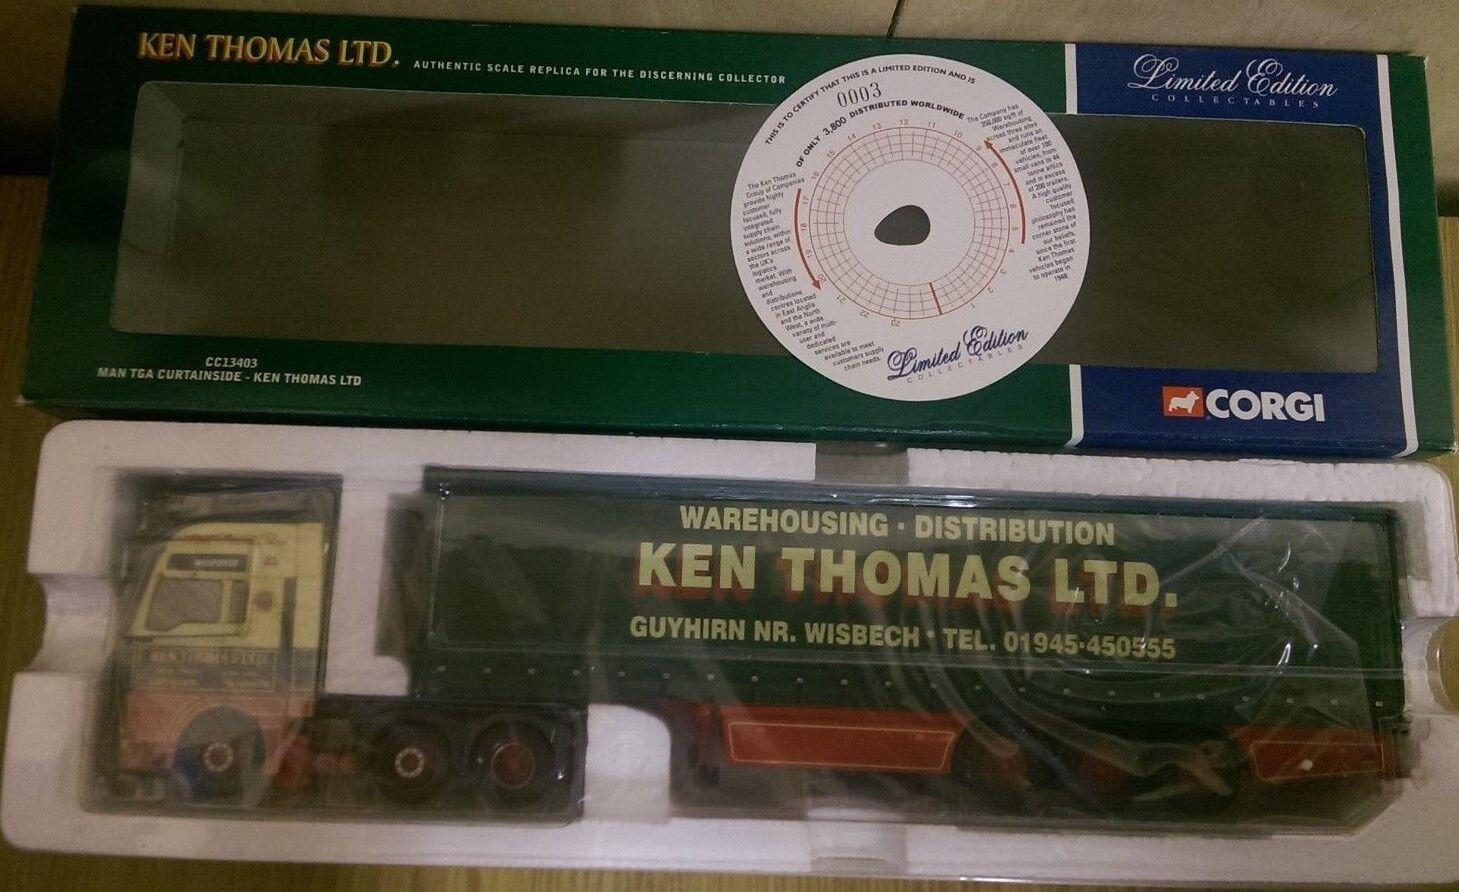 Corgi CC13403 MAN TGA Curtainside Ken Thomas Ltd Edition nr. 0003 of 3800